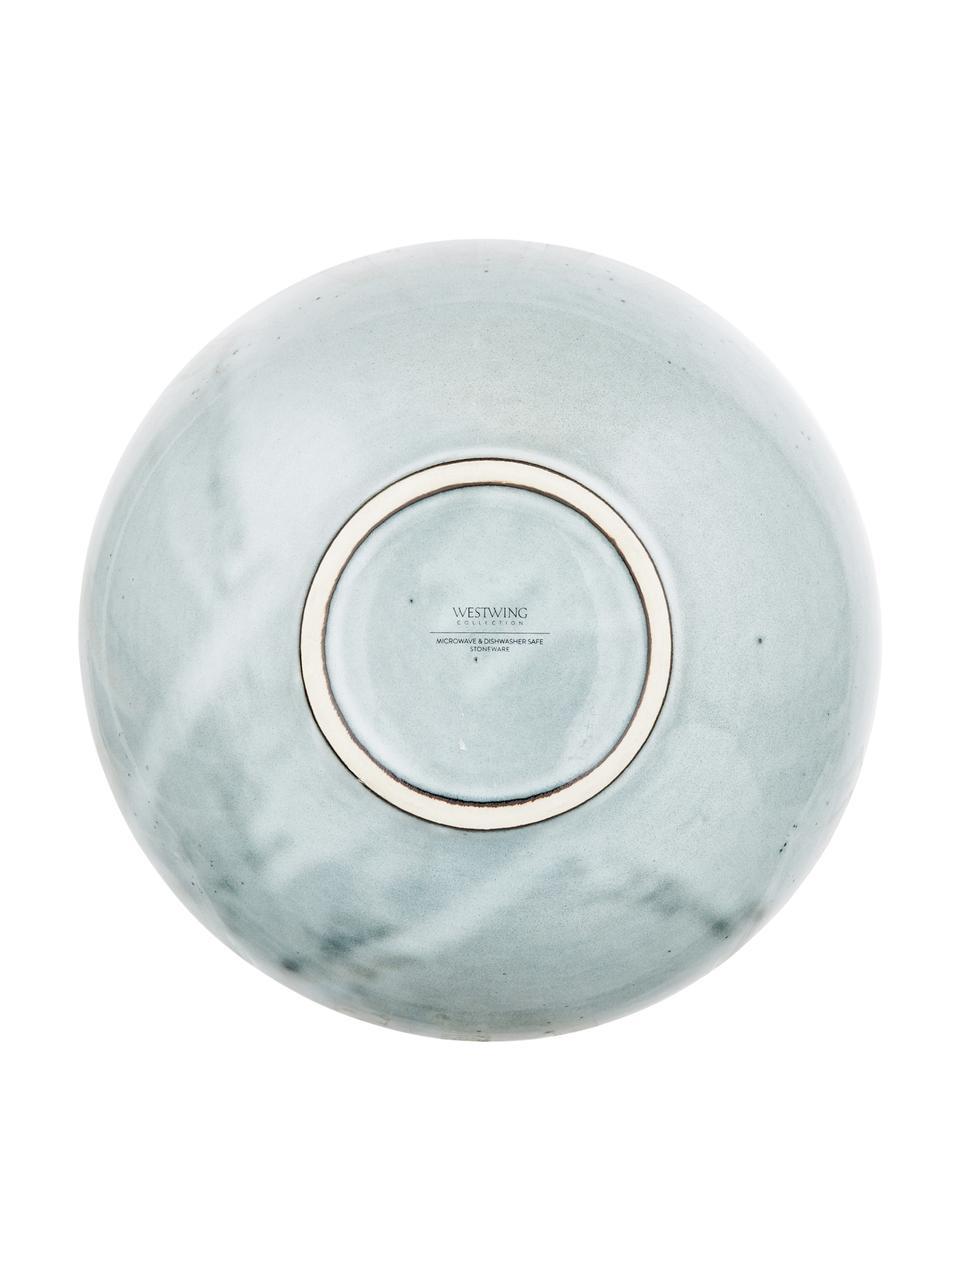 Ciotola fatta a mano Thalia 2 pz, Terracotta, Blu grigio, Ø 18 x Alt. 6 cm